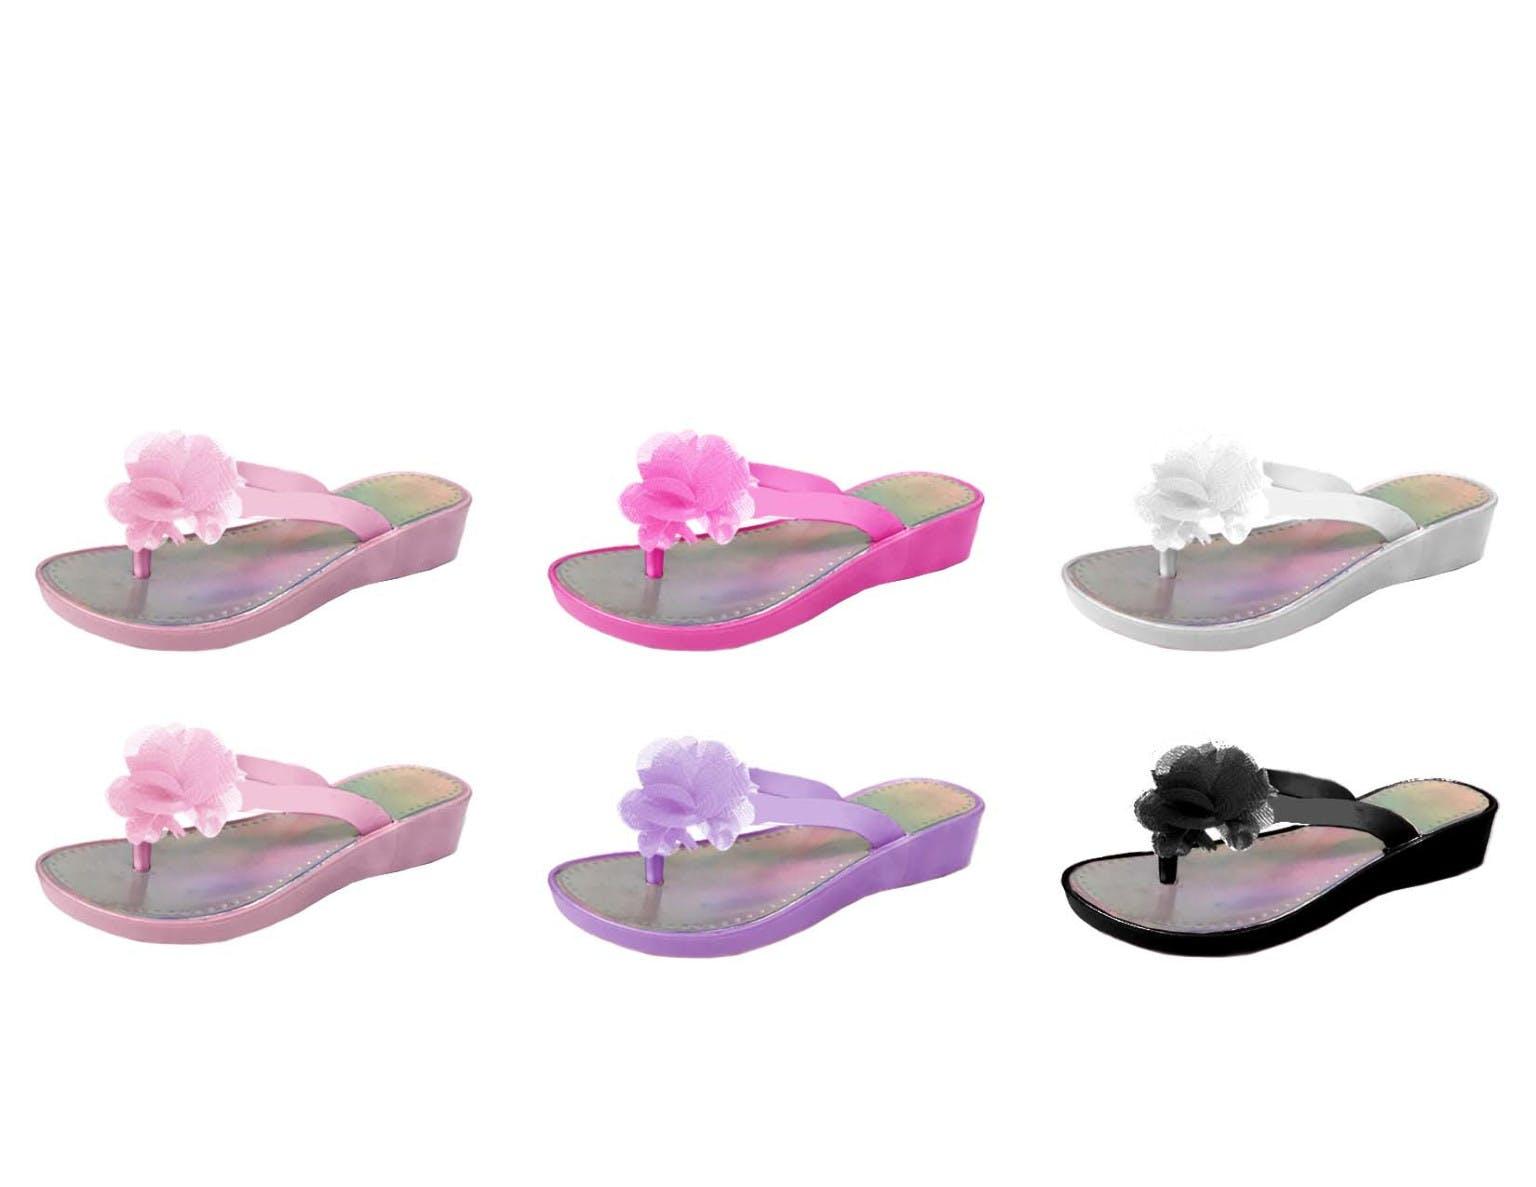 NWT Gymboree Outlet Girls Flip Flops Bag Lot Youth 2 3 Flamingo Sandals Shoes